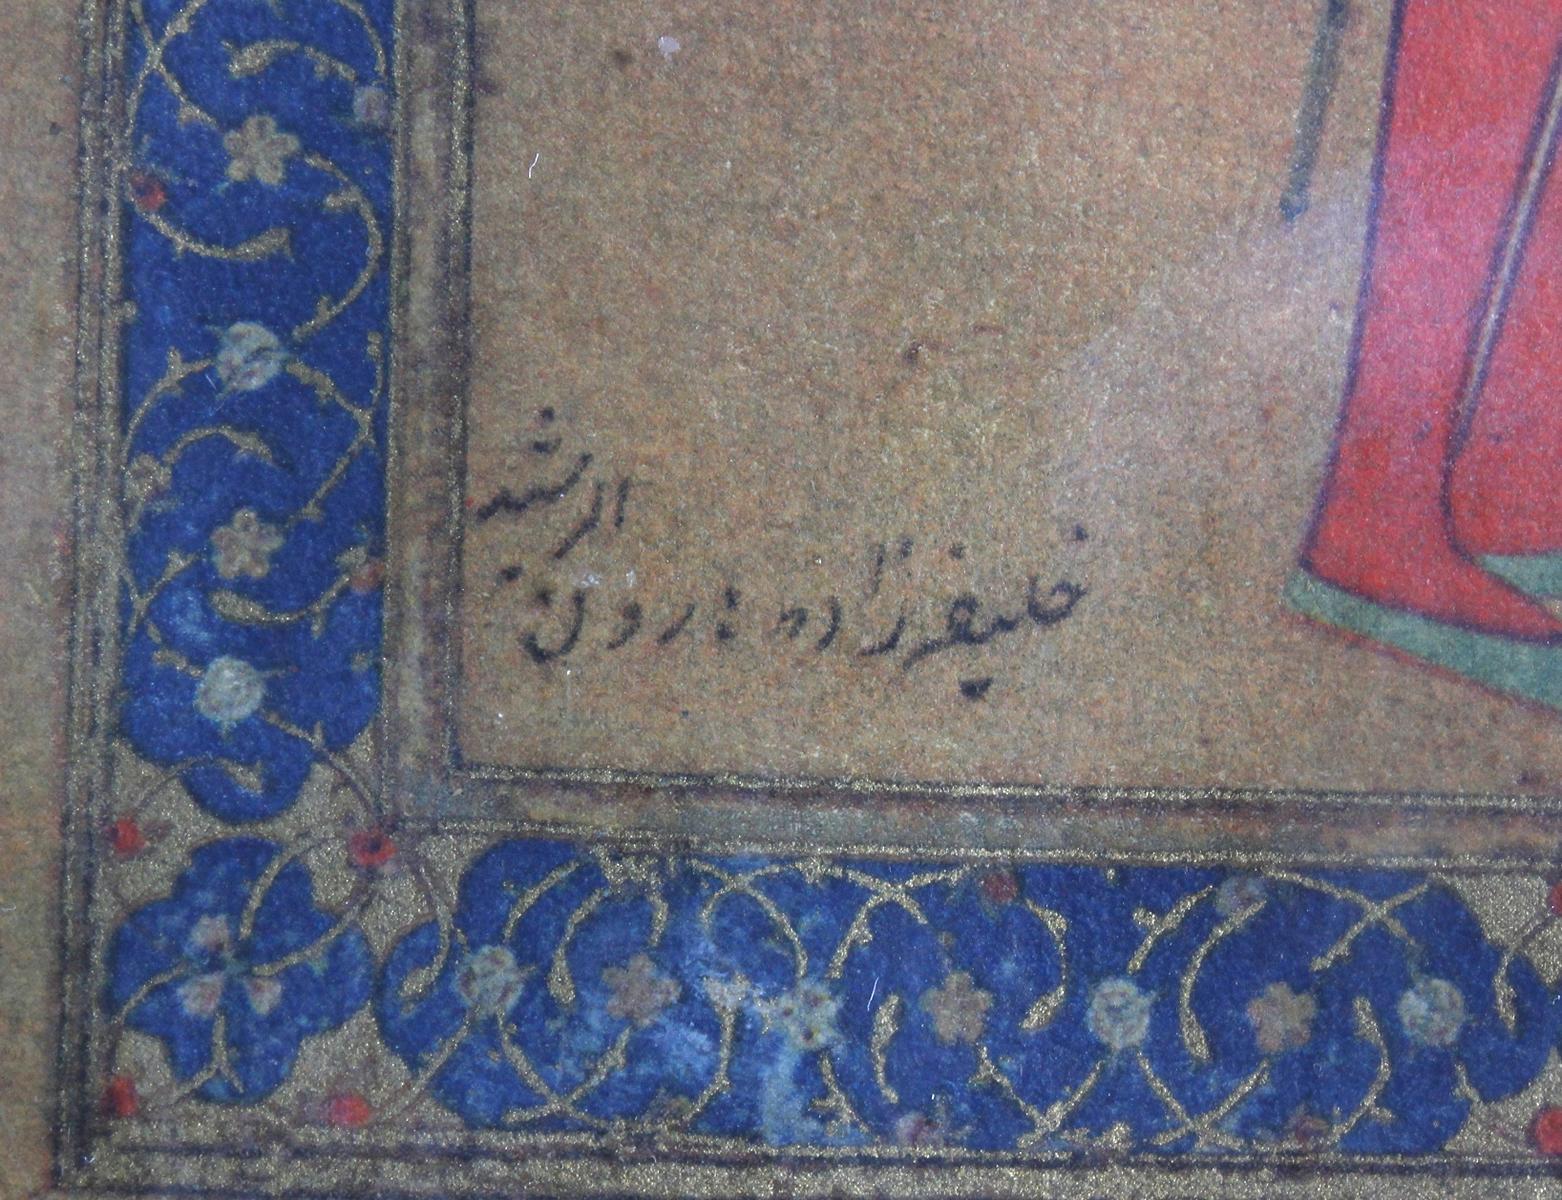 Persische Malerei, 17. Jahrhundert-2